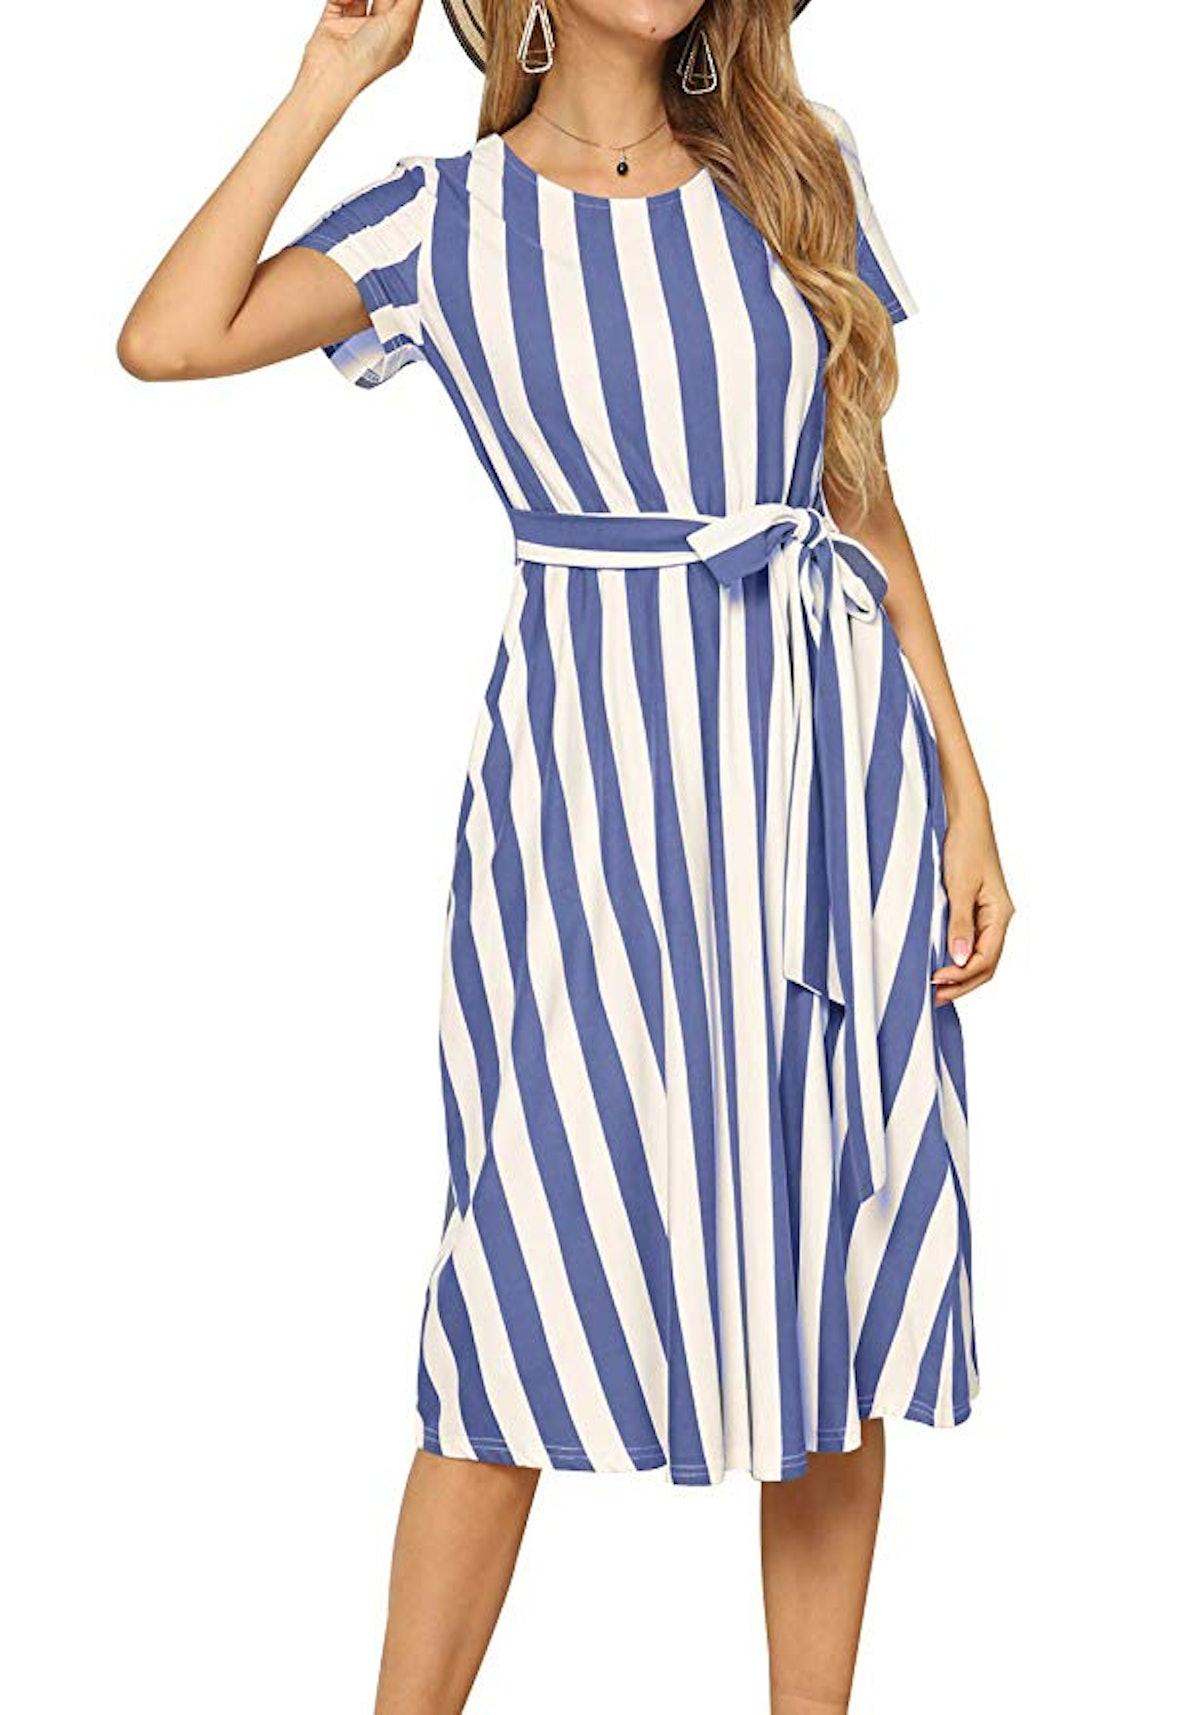 levaca Women's Short Sleeve Belt Dress with Pockets